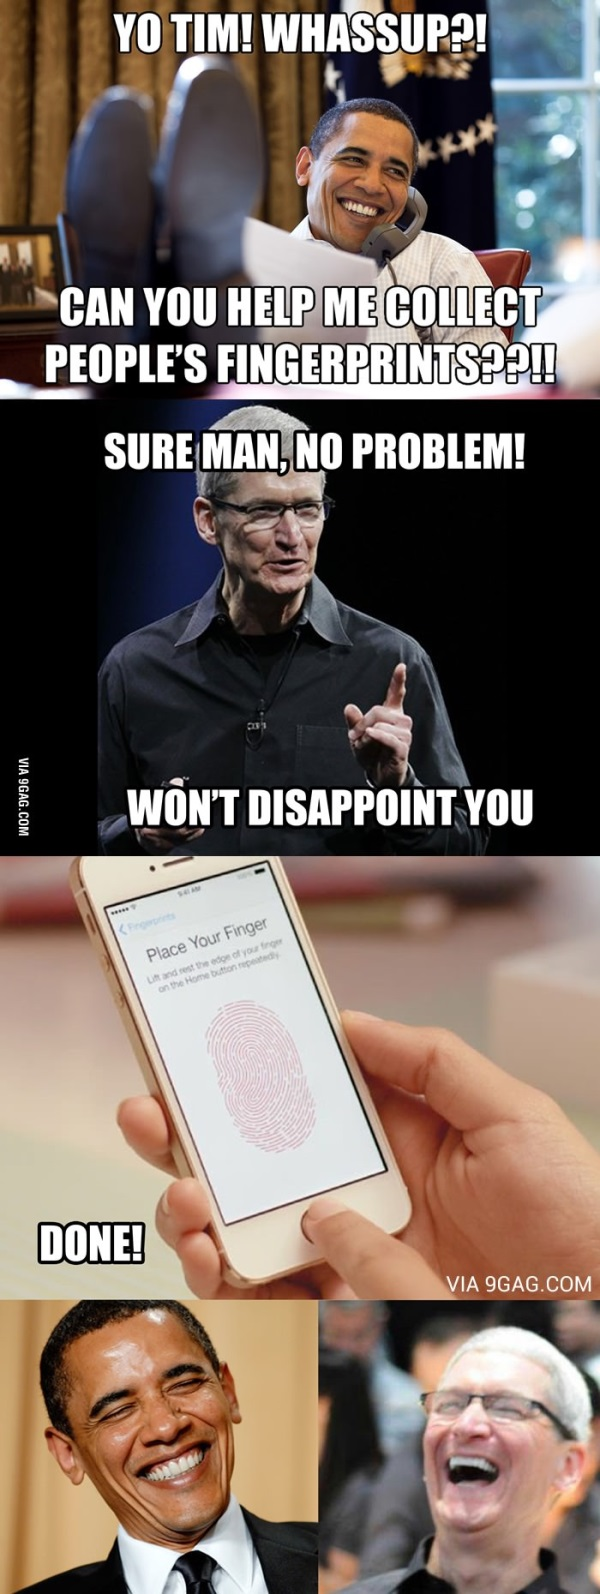 iphone-vtip